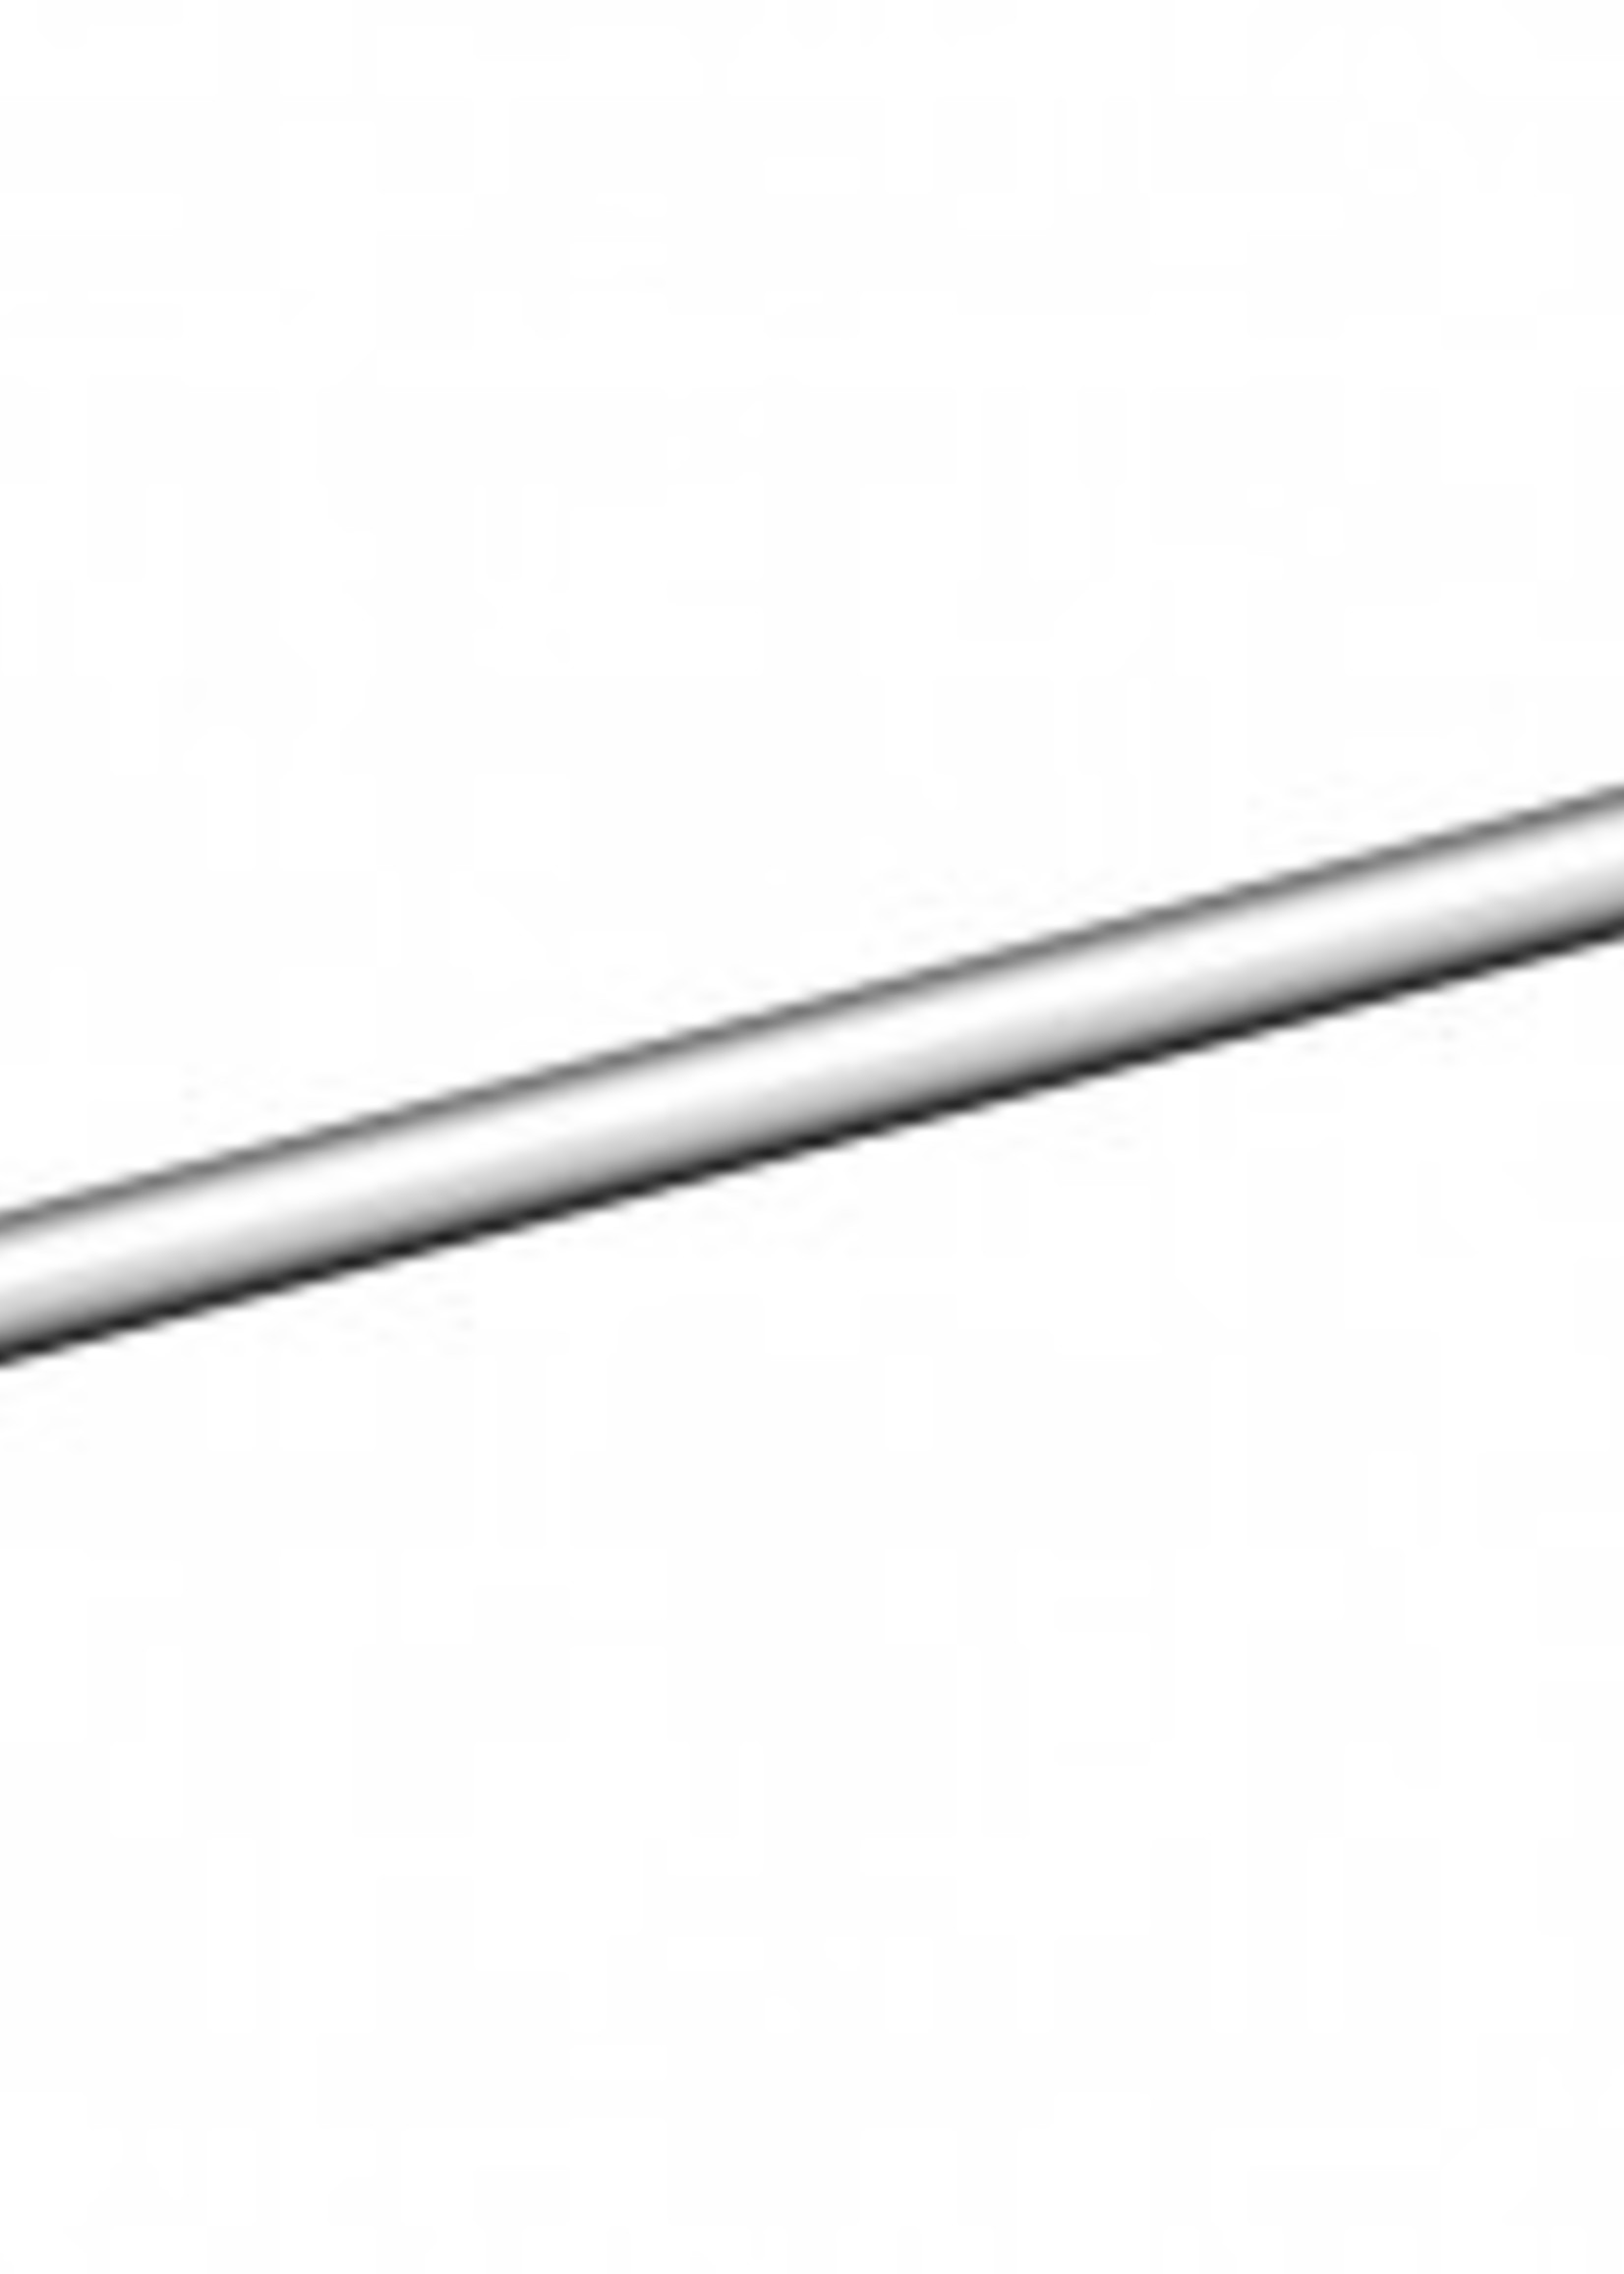 Layher Diagonaal 1.09 x 2.00 meter